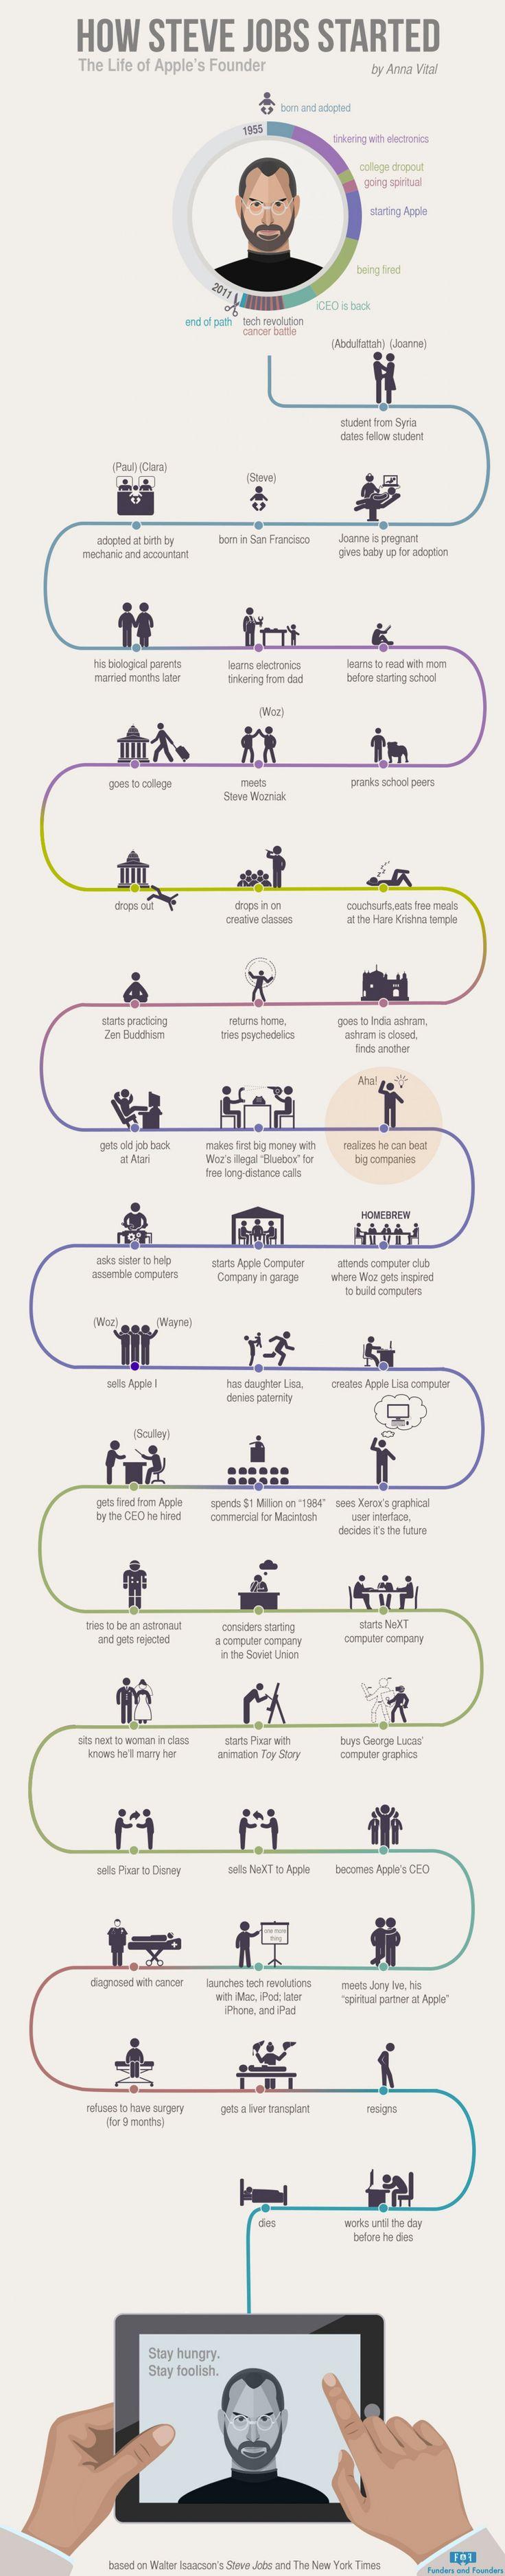 Steve Jobs' Pivotal Life Moments (Infographic) -스티브잡스 일대기(사적으로든,공적으로든) 다음 강의 때 연결시켜서 써볼 수도 있을 것 같다.